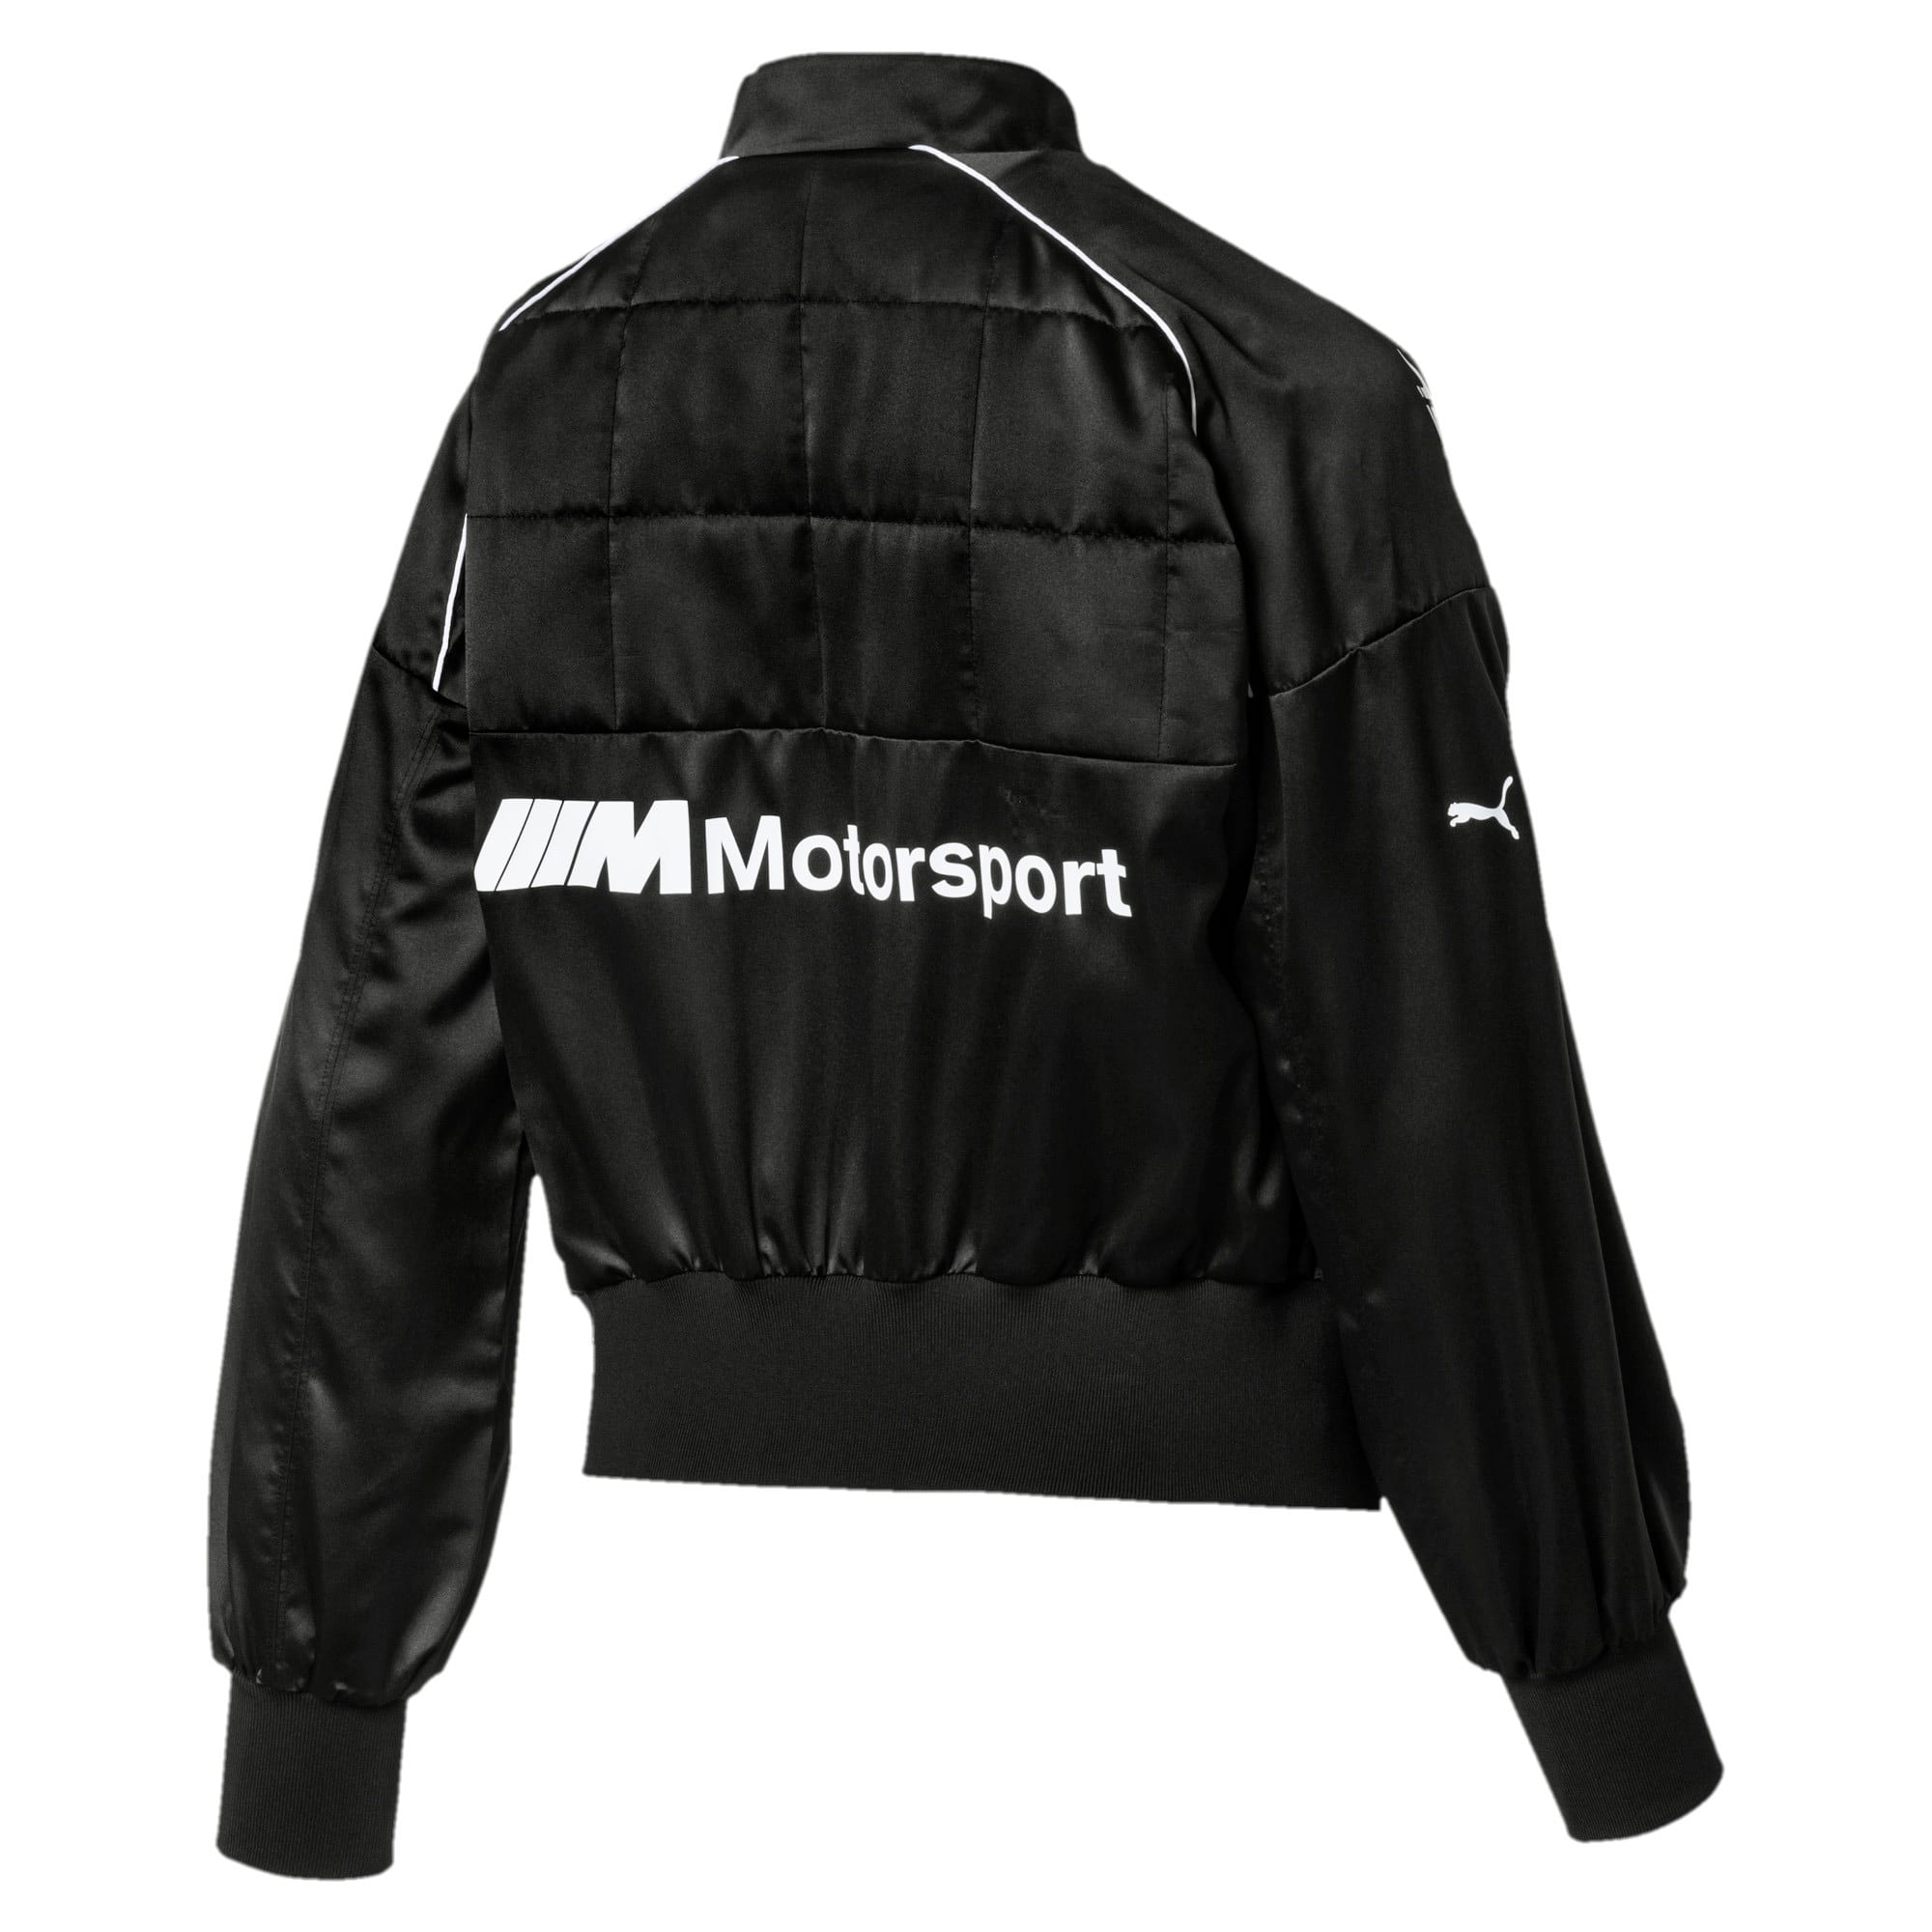 Thumbnail 5 of BMW M Motorsport Women's Street Jacket, Puma Black, medium